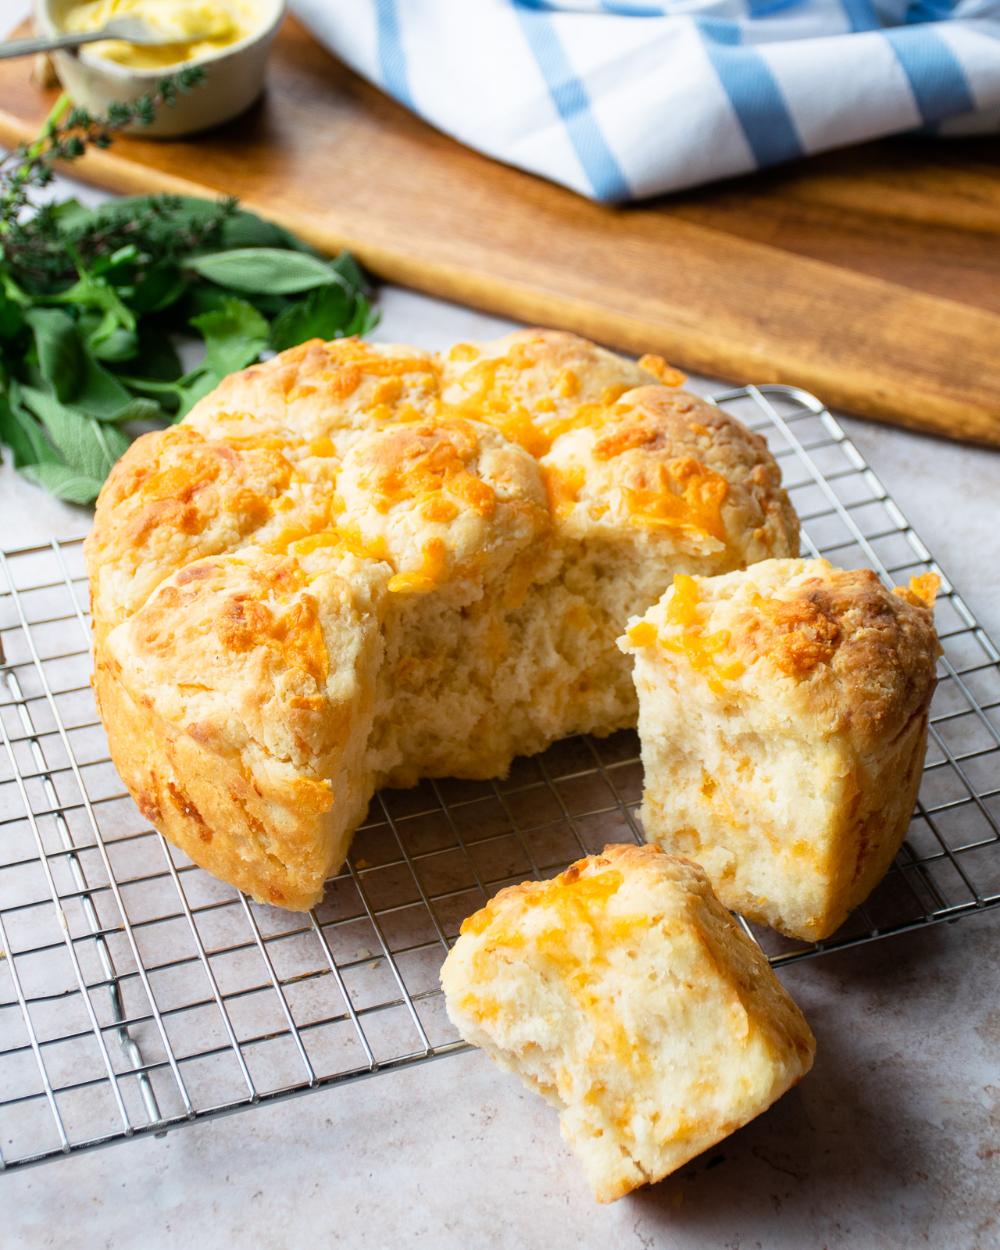 Cheddar Cheese Biscuits Recipe Biscuit recipe, Air